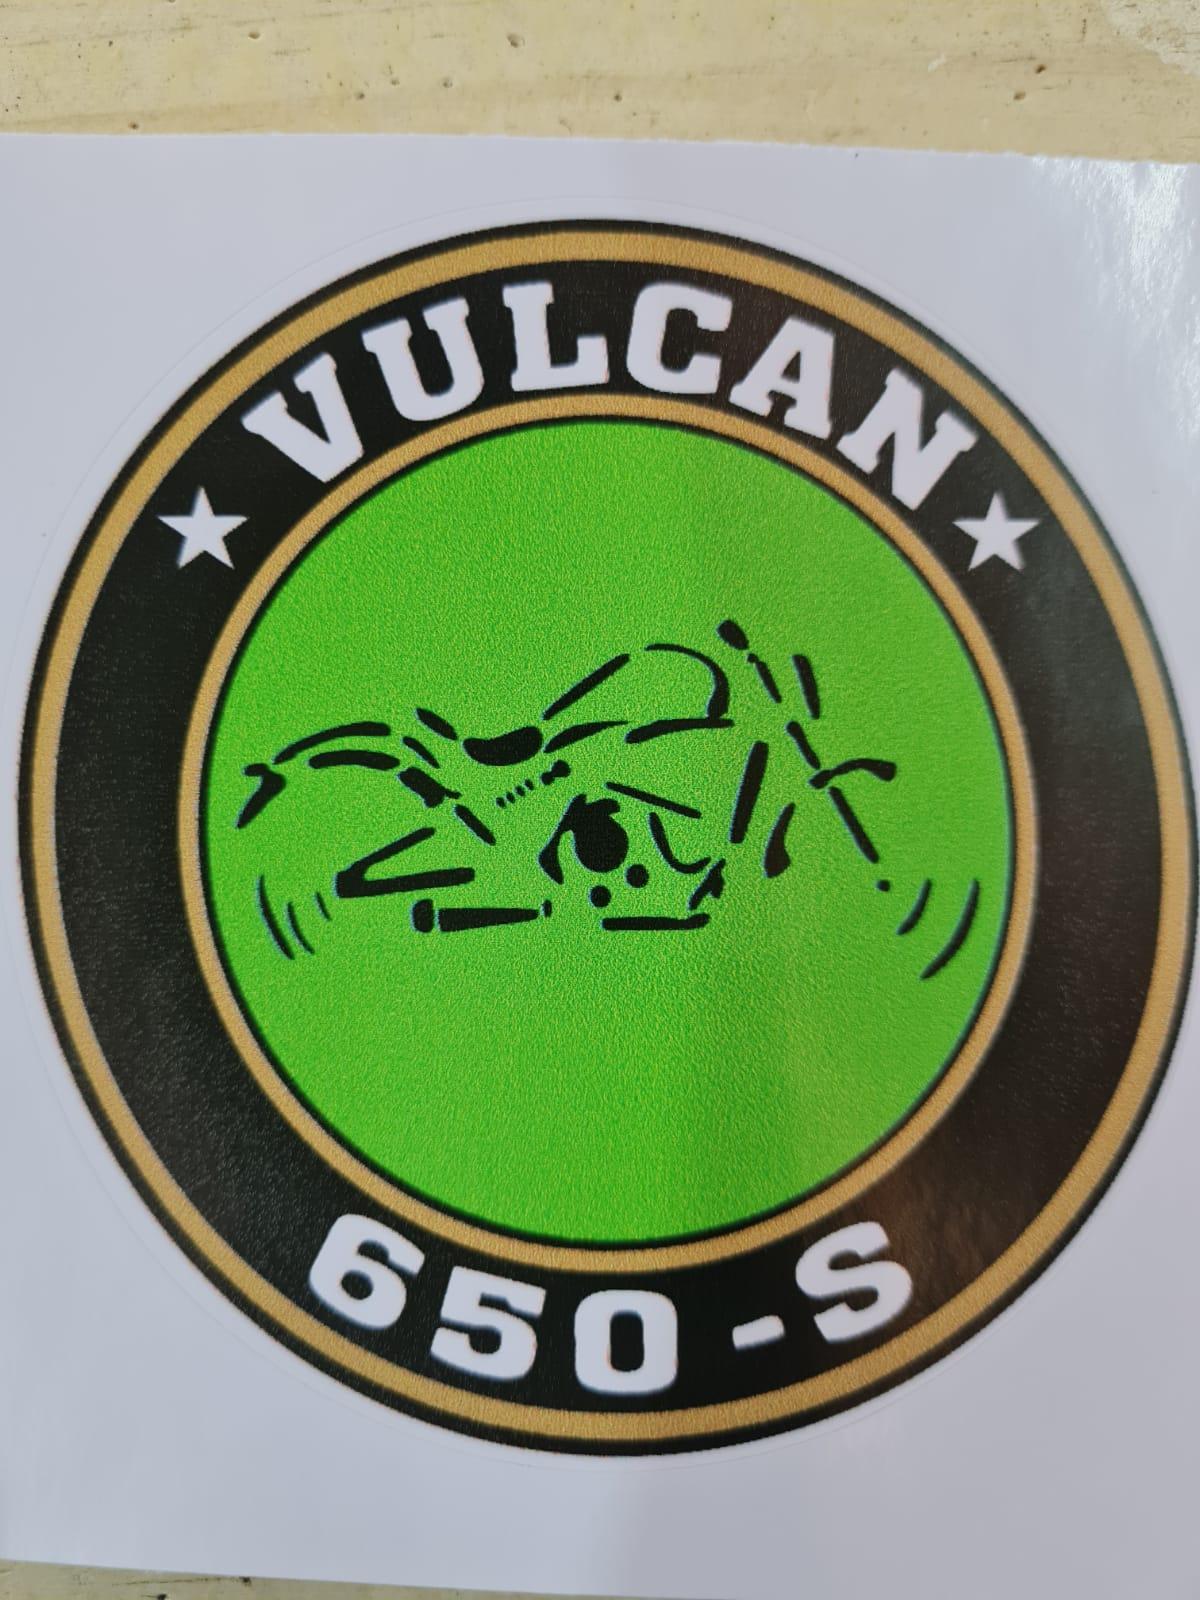 Adesivo Vulcan 650